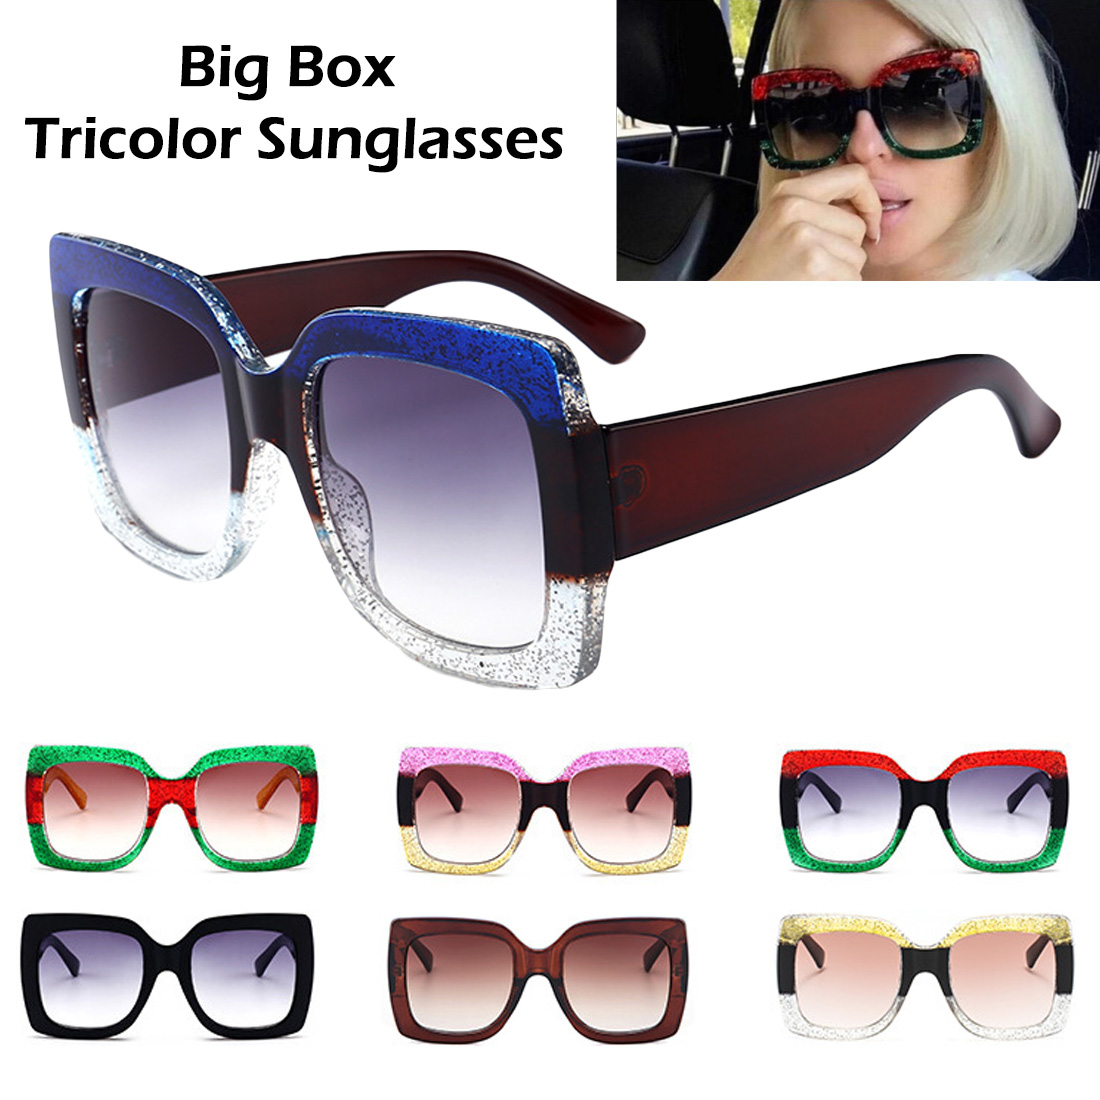 Sunglasses Women Bee Retro Glasses Men Gafas Big Box Oversized Vintage Polygon sunglass women